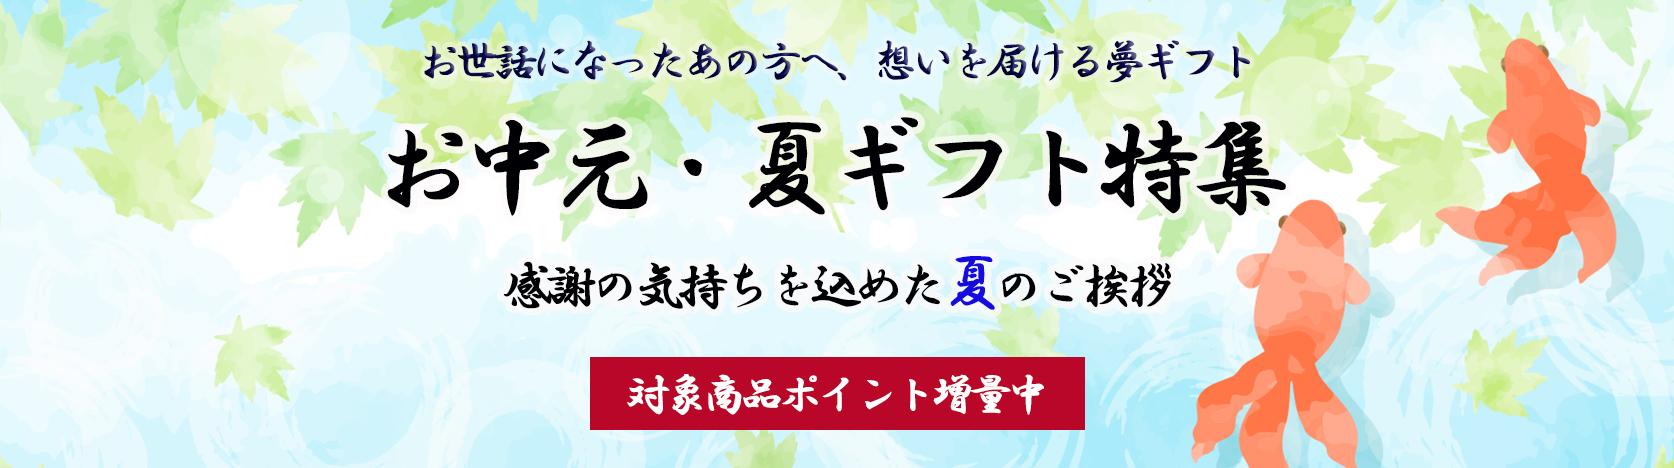 https://gigaplus.makeshop.jp/matchashop/img/feature/aiya-bana-pc.jpg